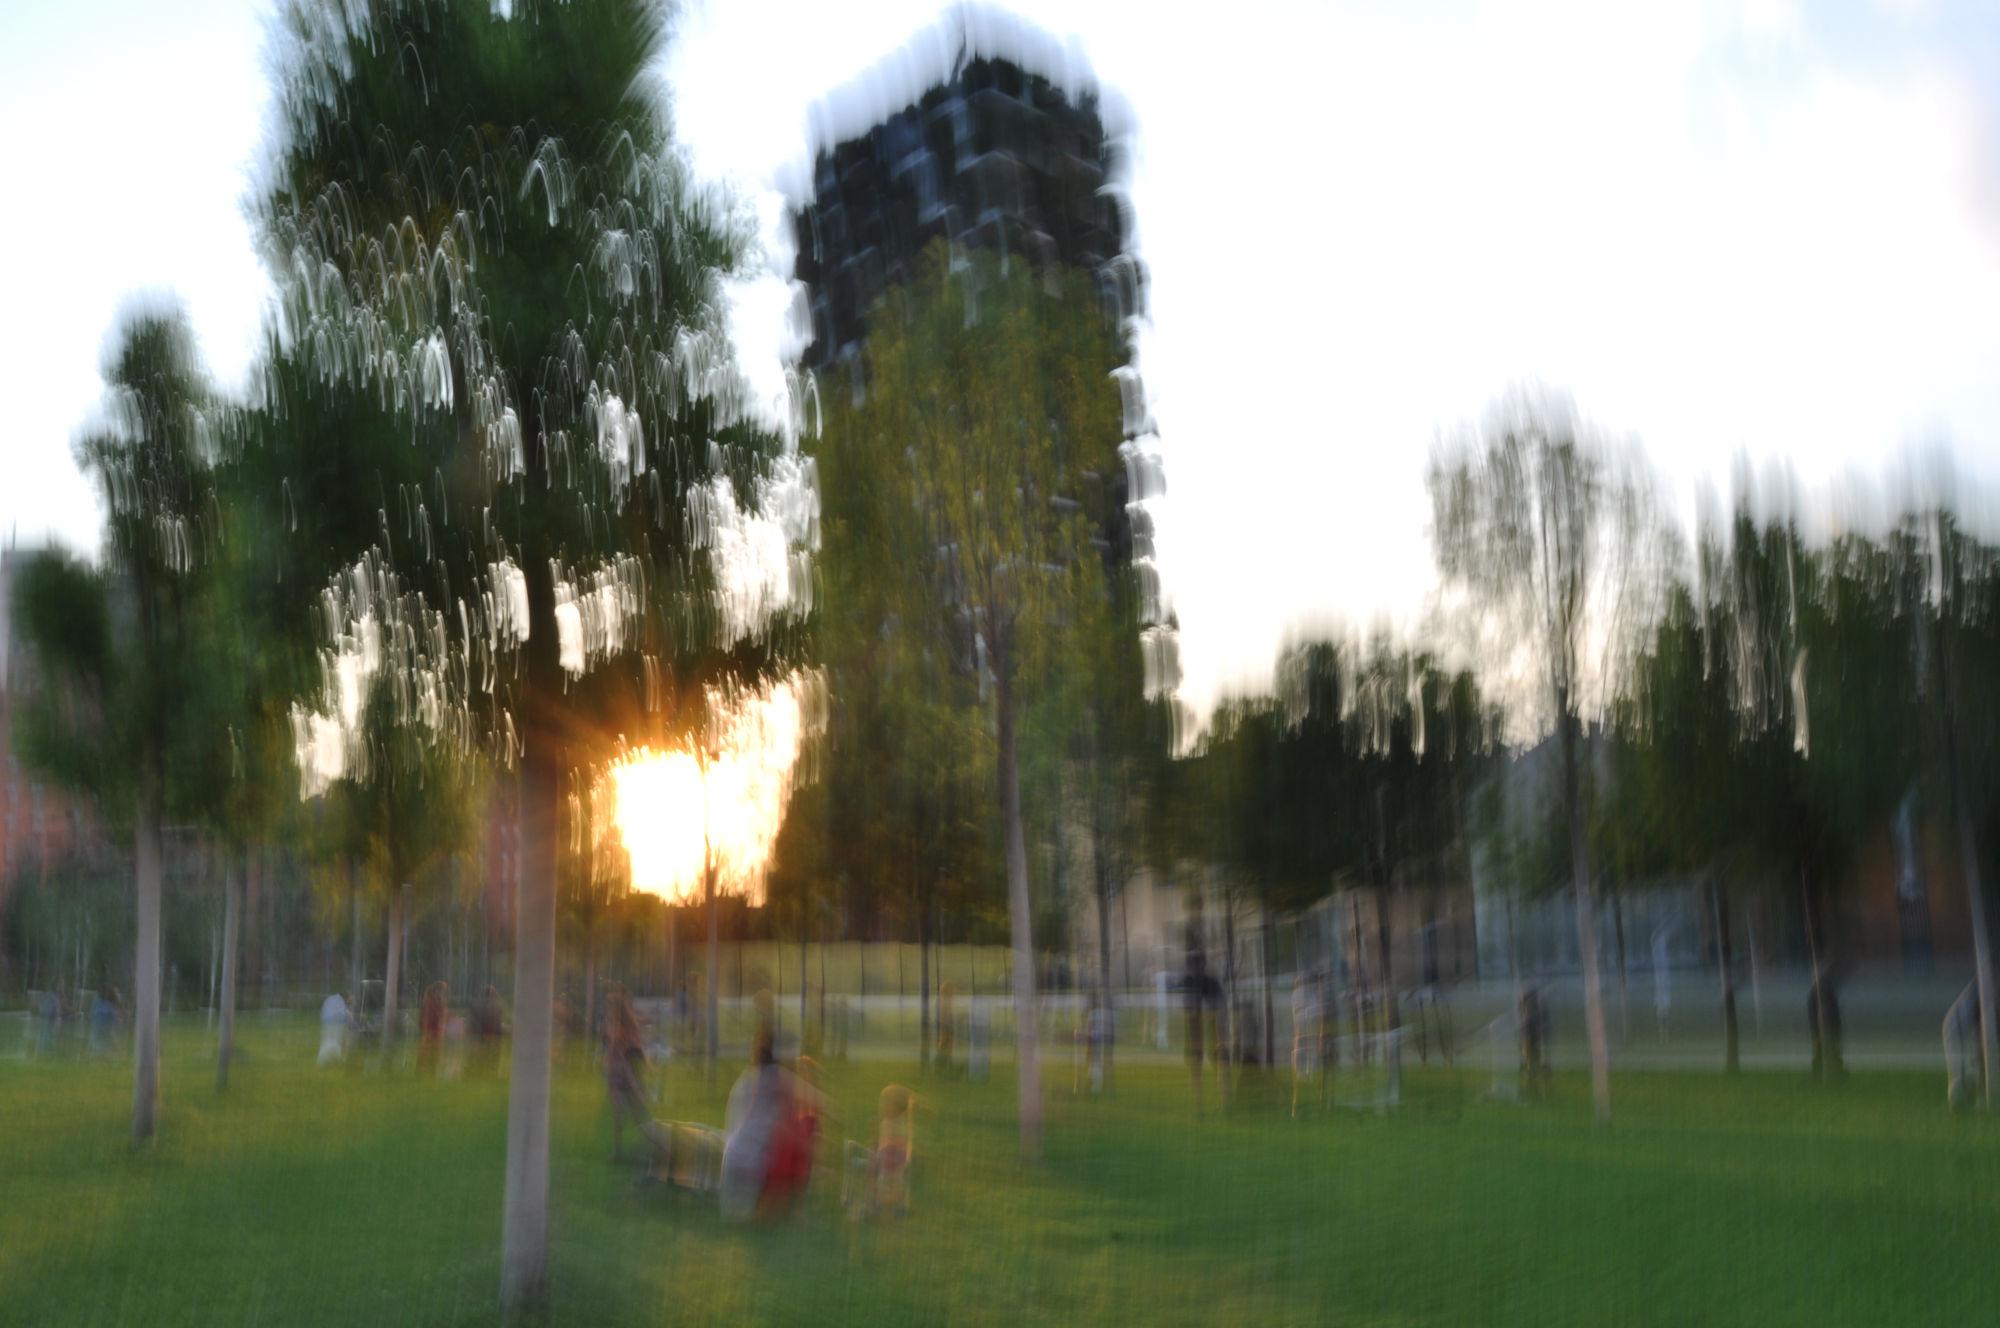 foto mosse milano bosco verticale 2020 0057b